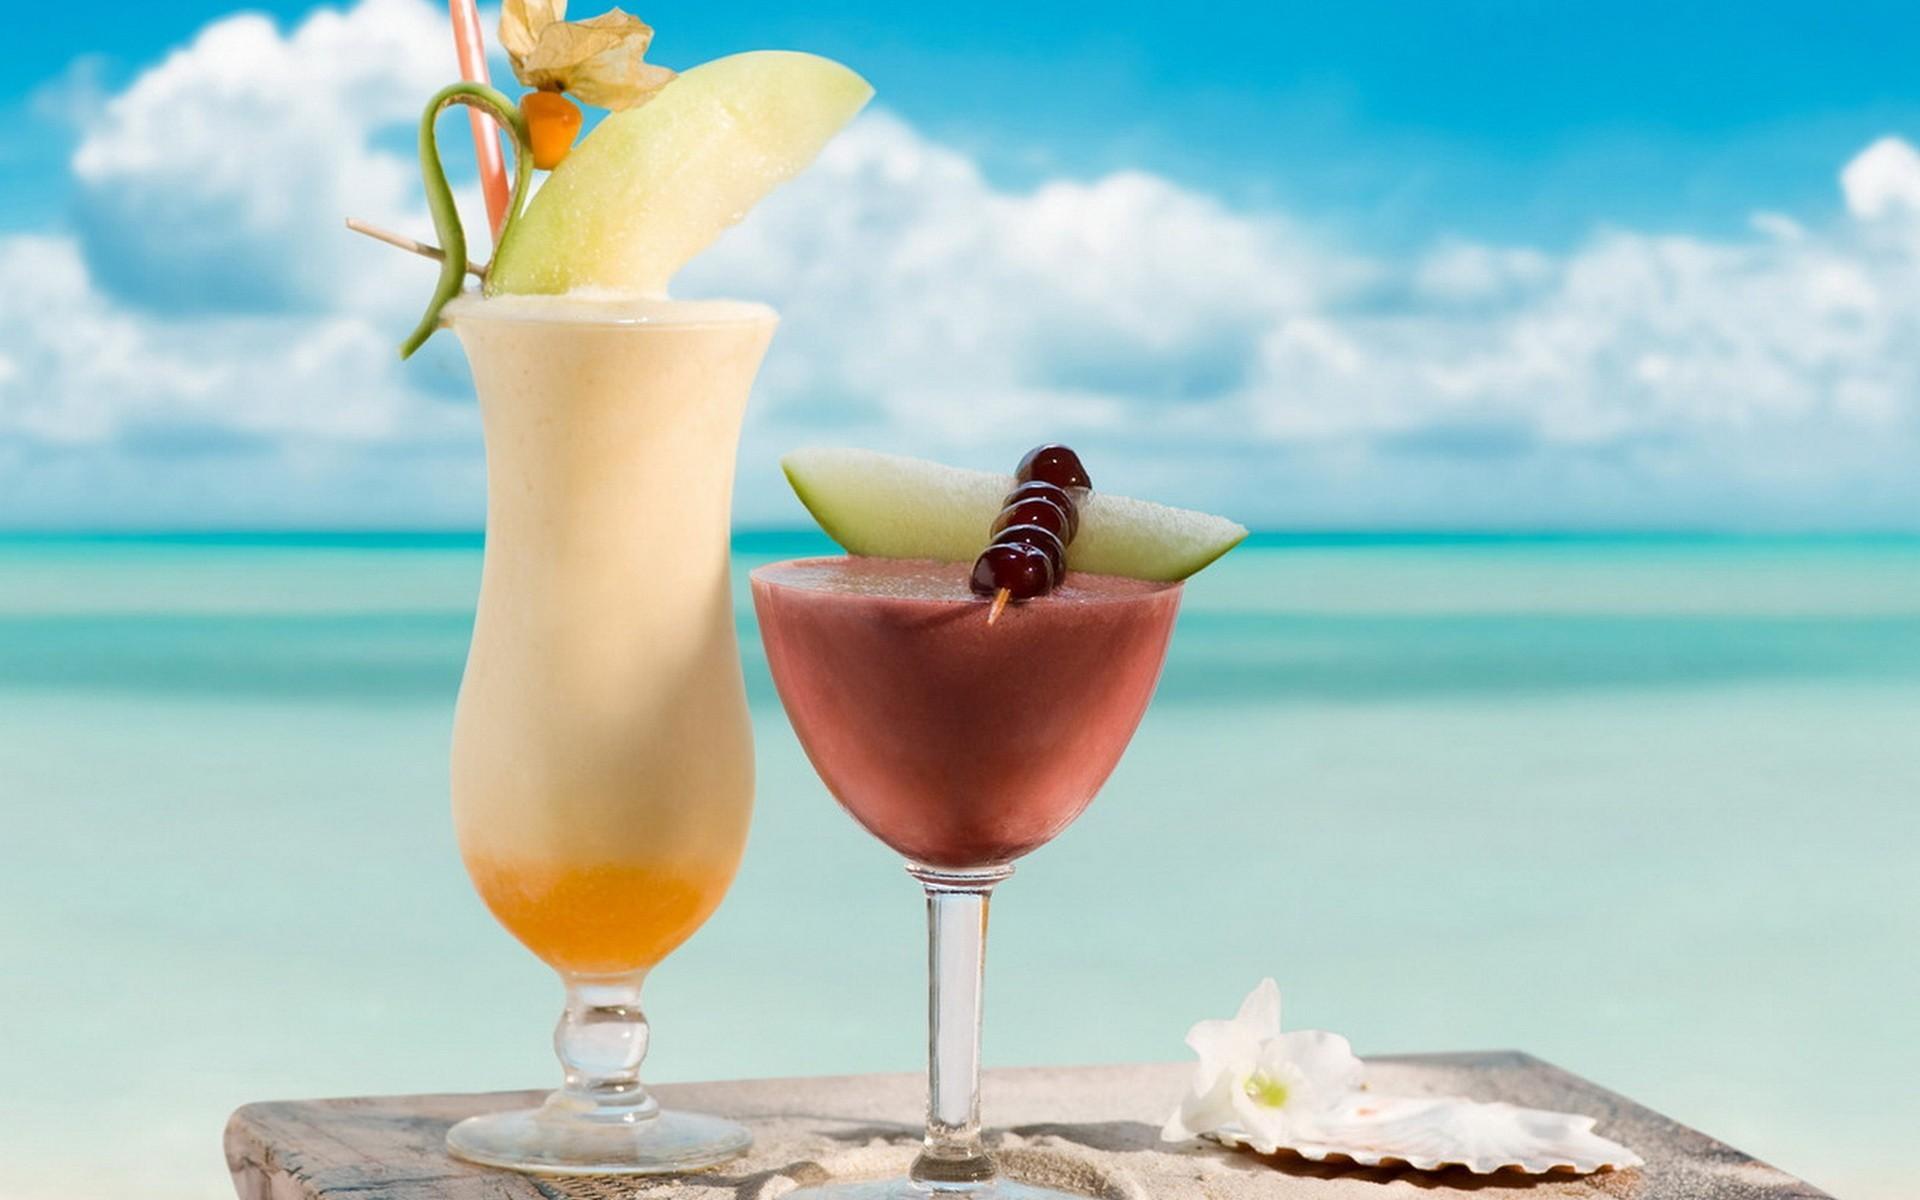 Lebensmittel aus der Karibik